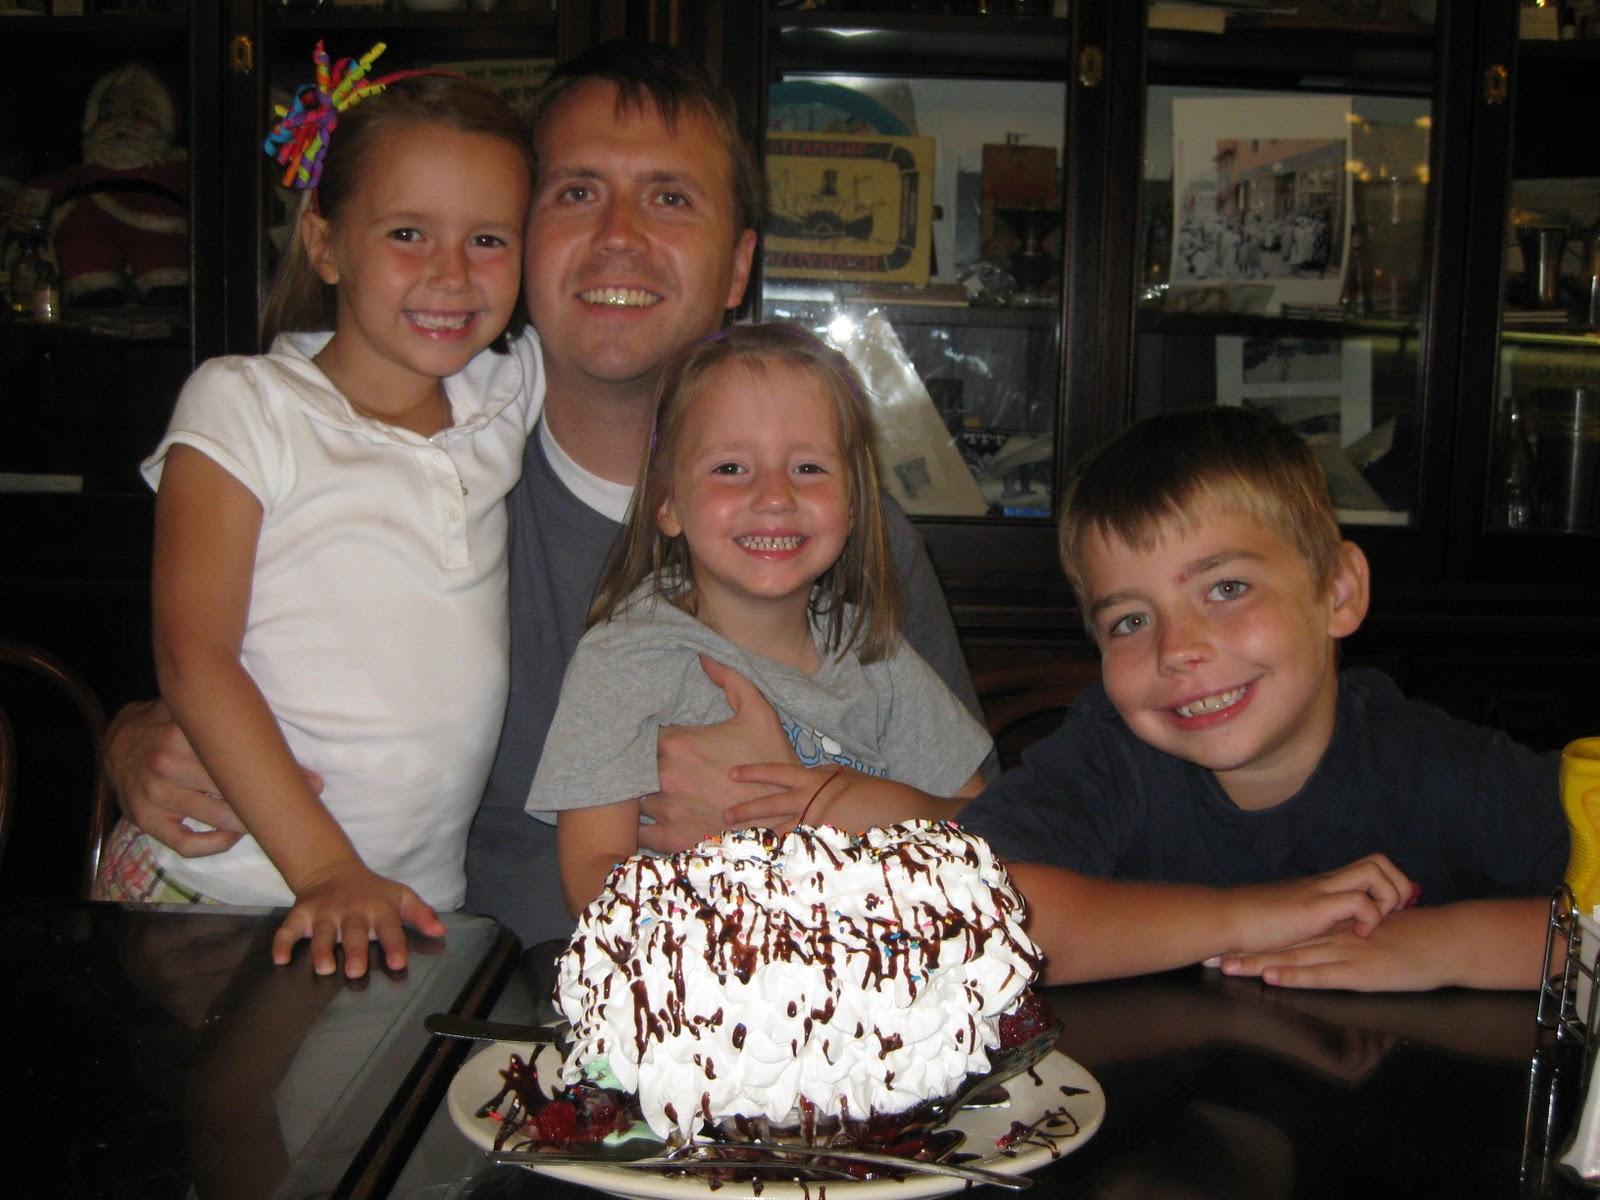 Celebrating with a birthday sundae